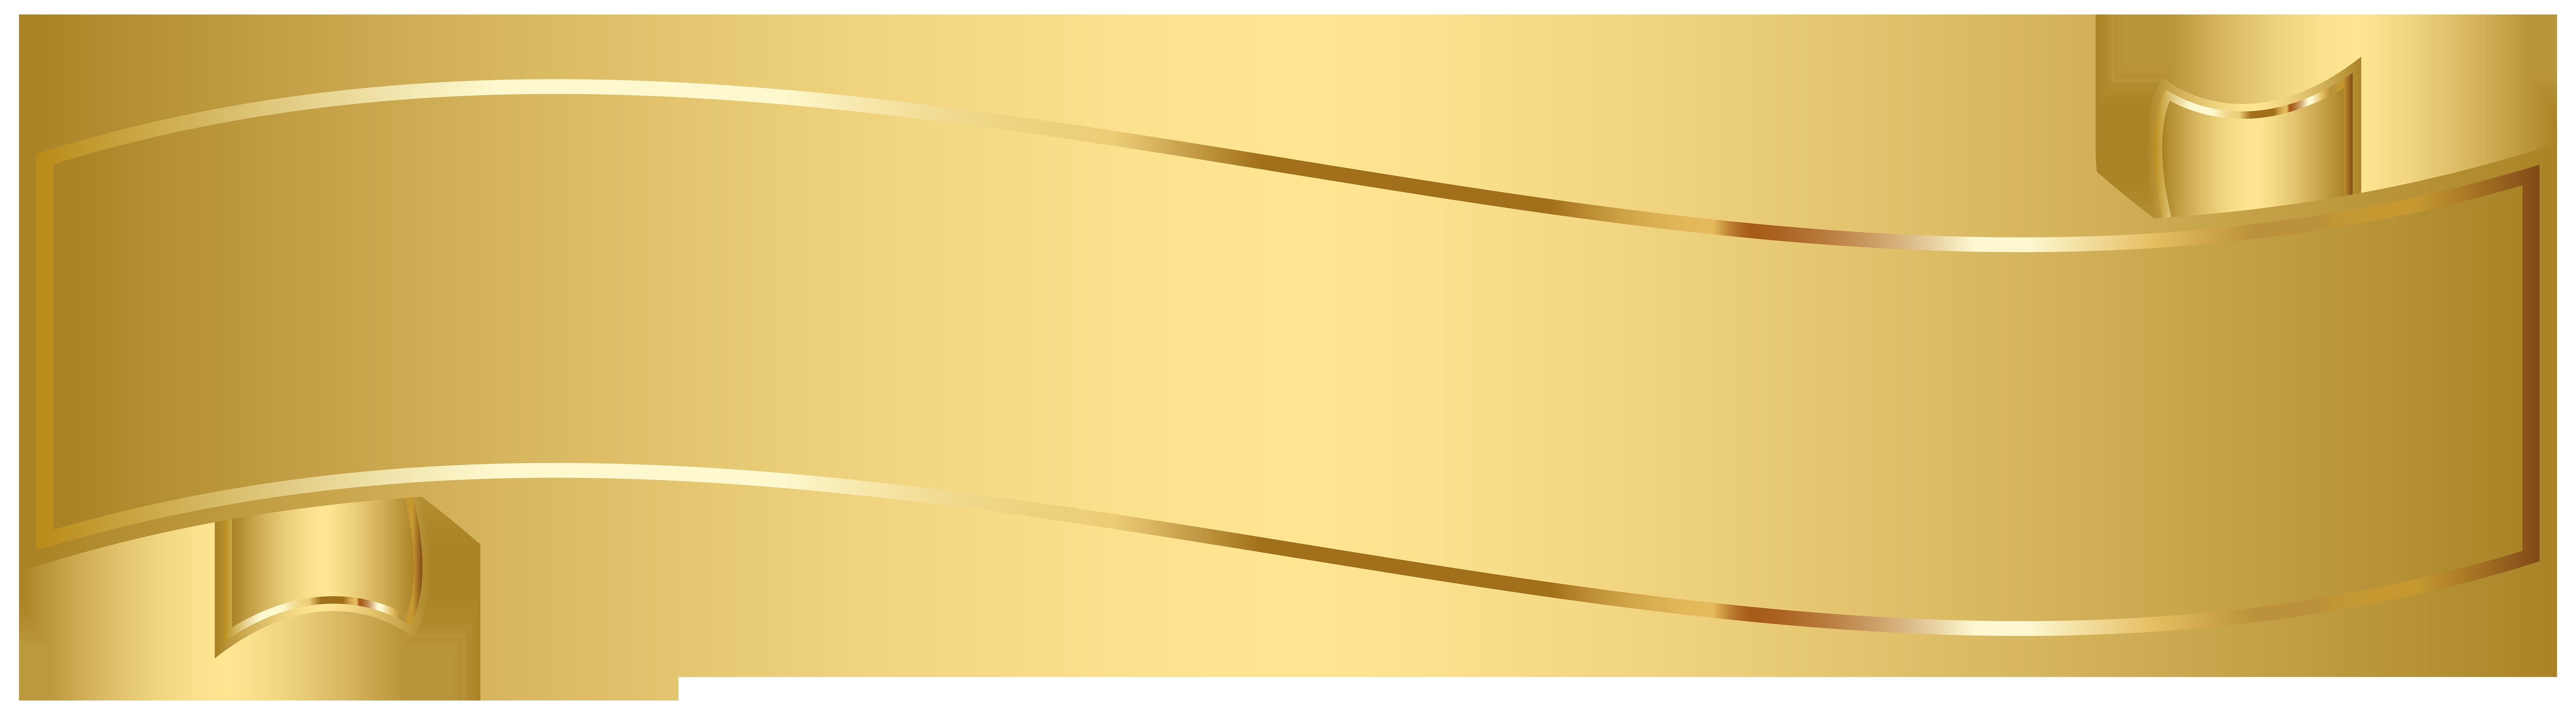 Scroll clipart gold. Banner clip art png